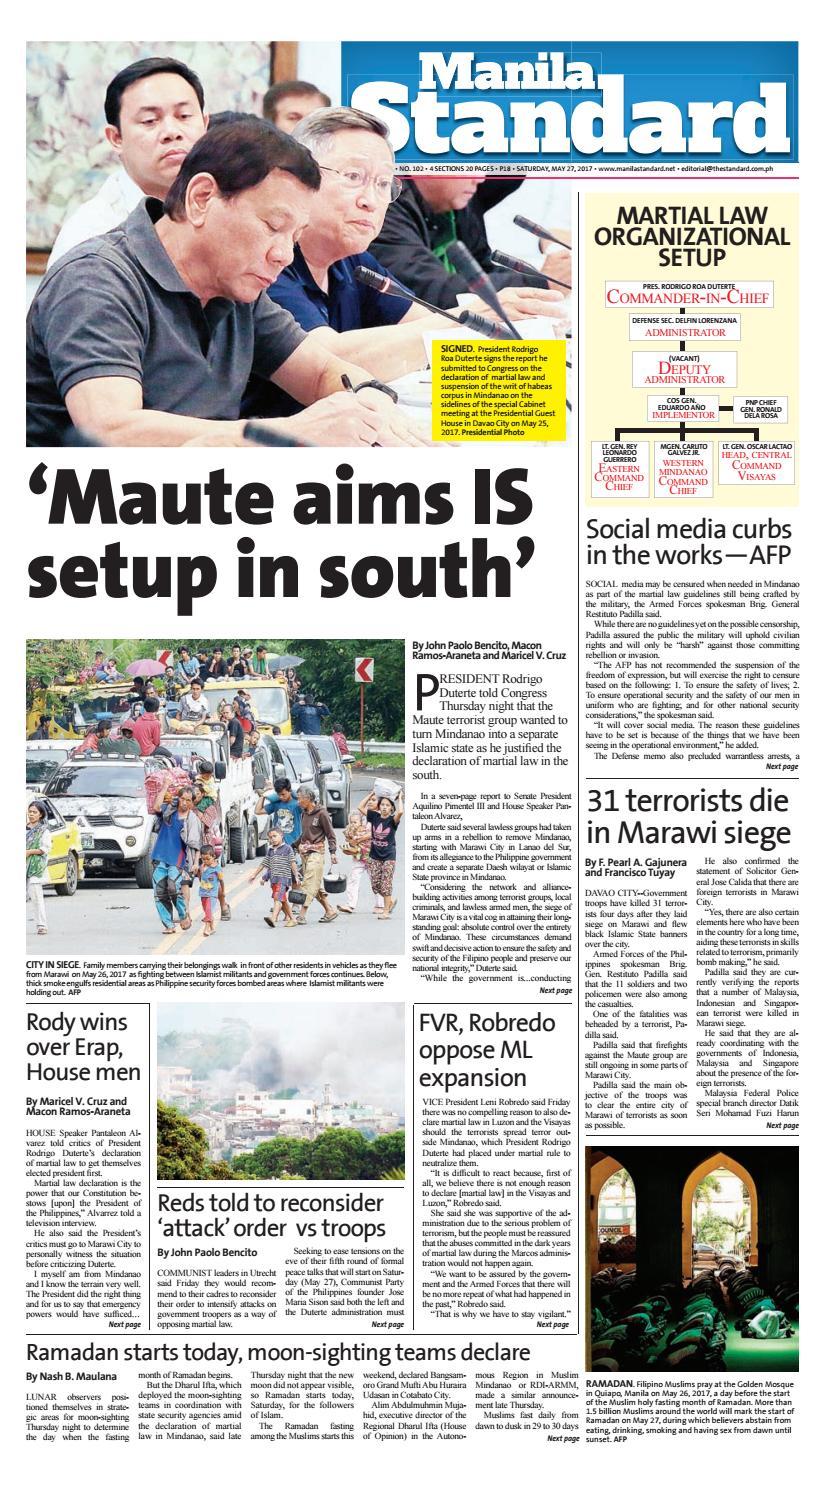 Manila Standard - 2017 May 27 - Saturday by Manila Standard